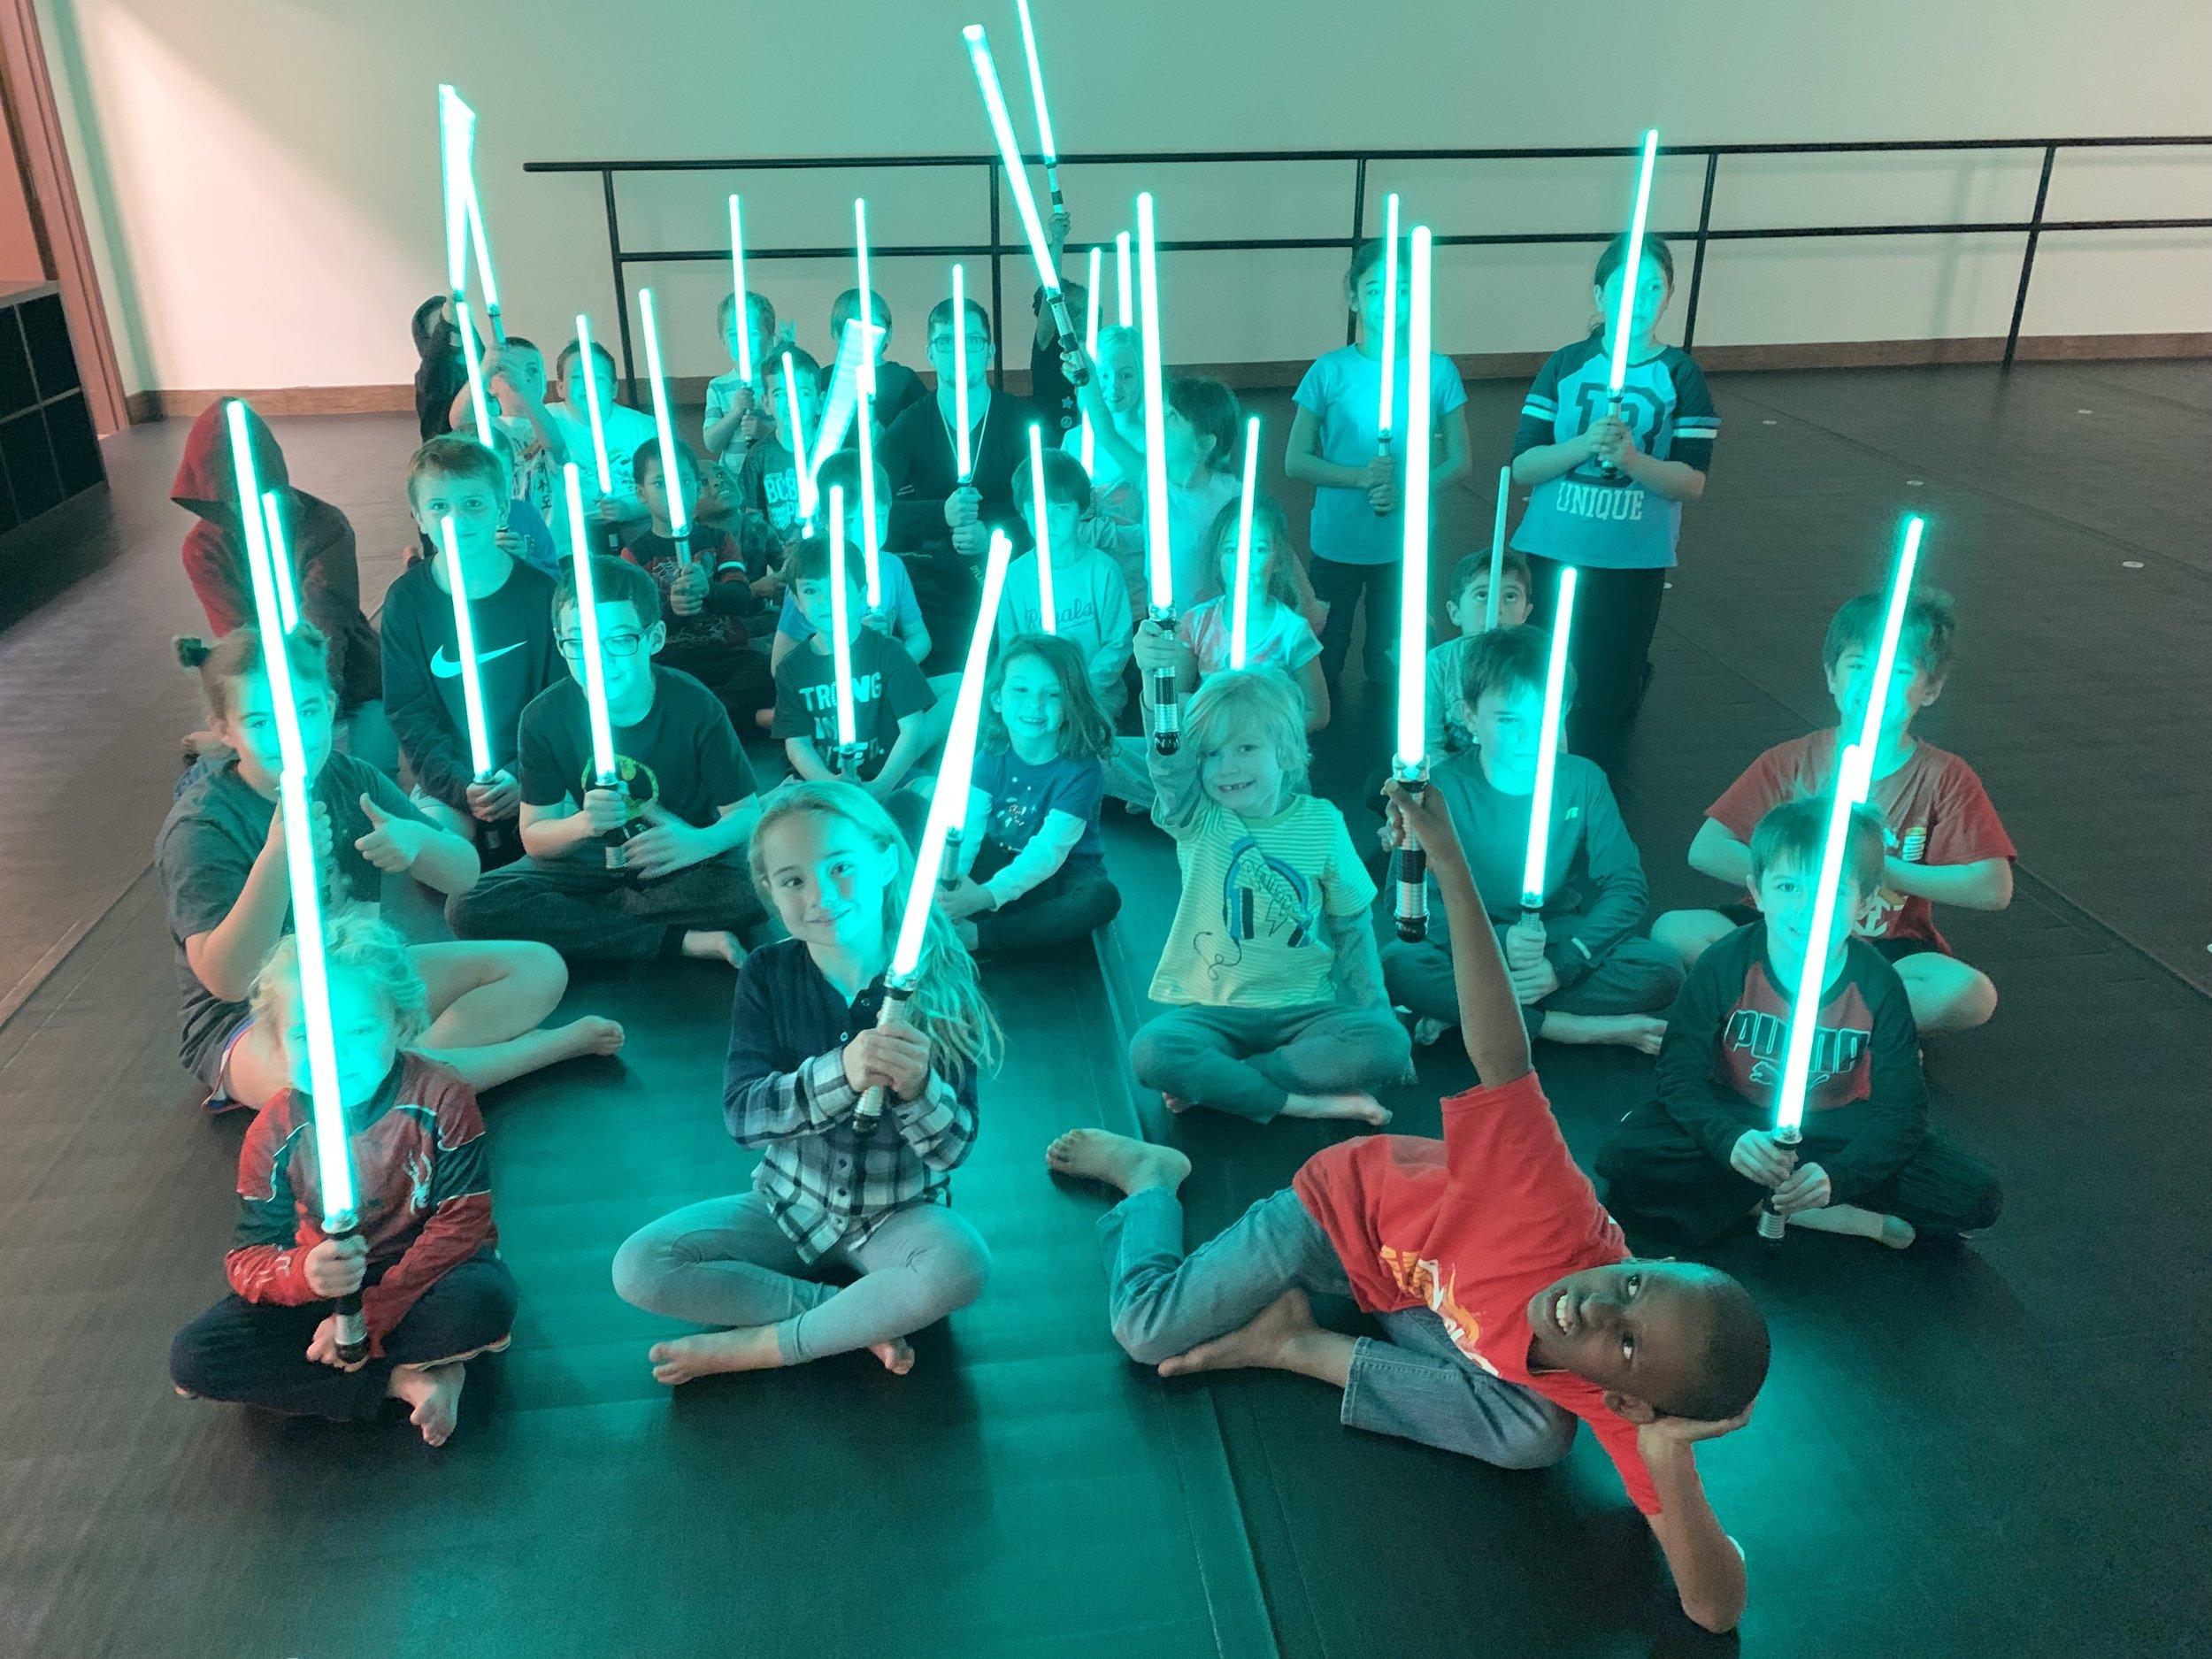 light-saber-parents-night-out-for-kids-southlake-texas.jpeg